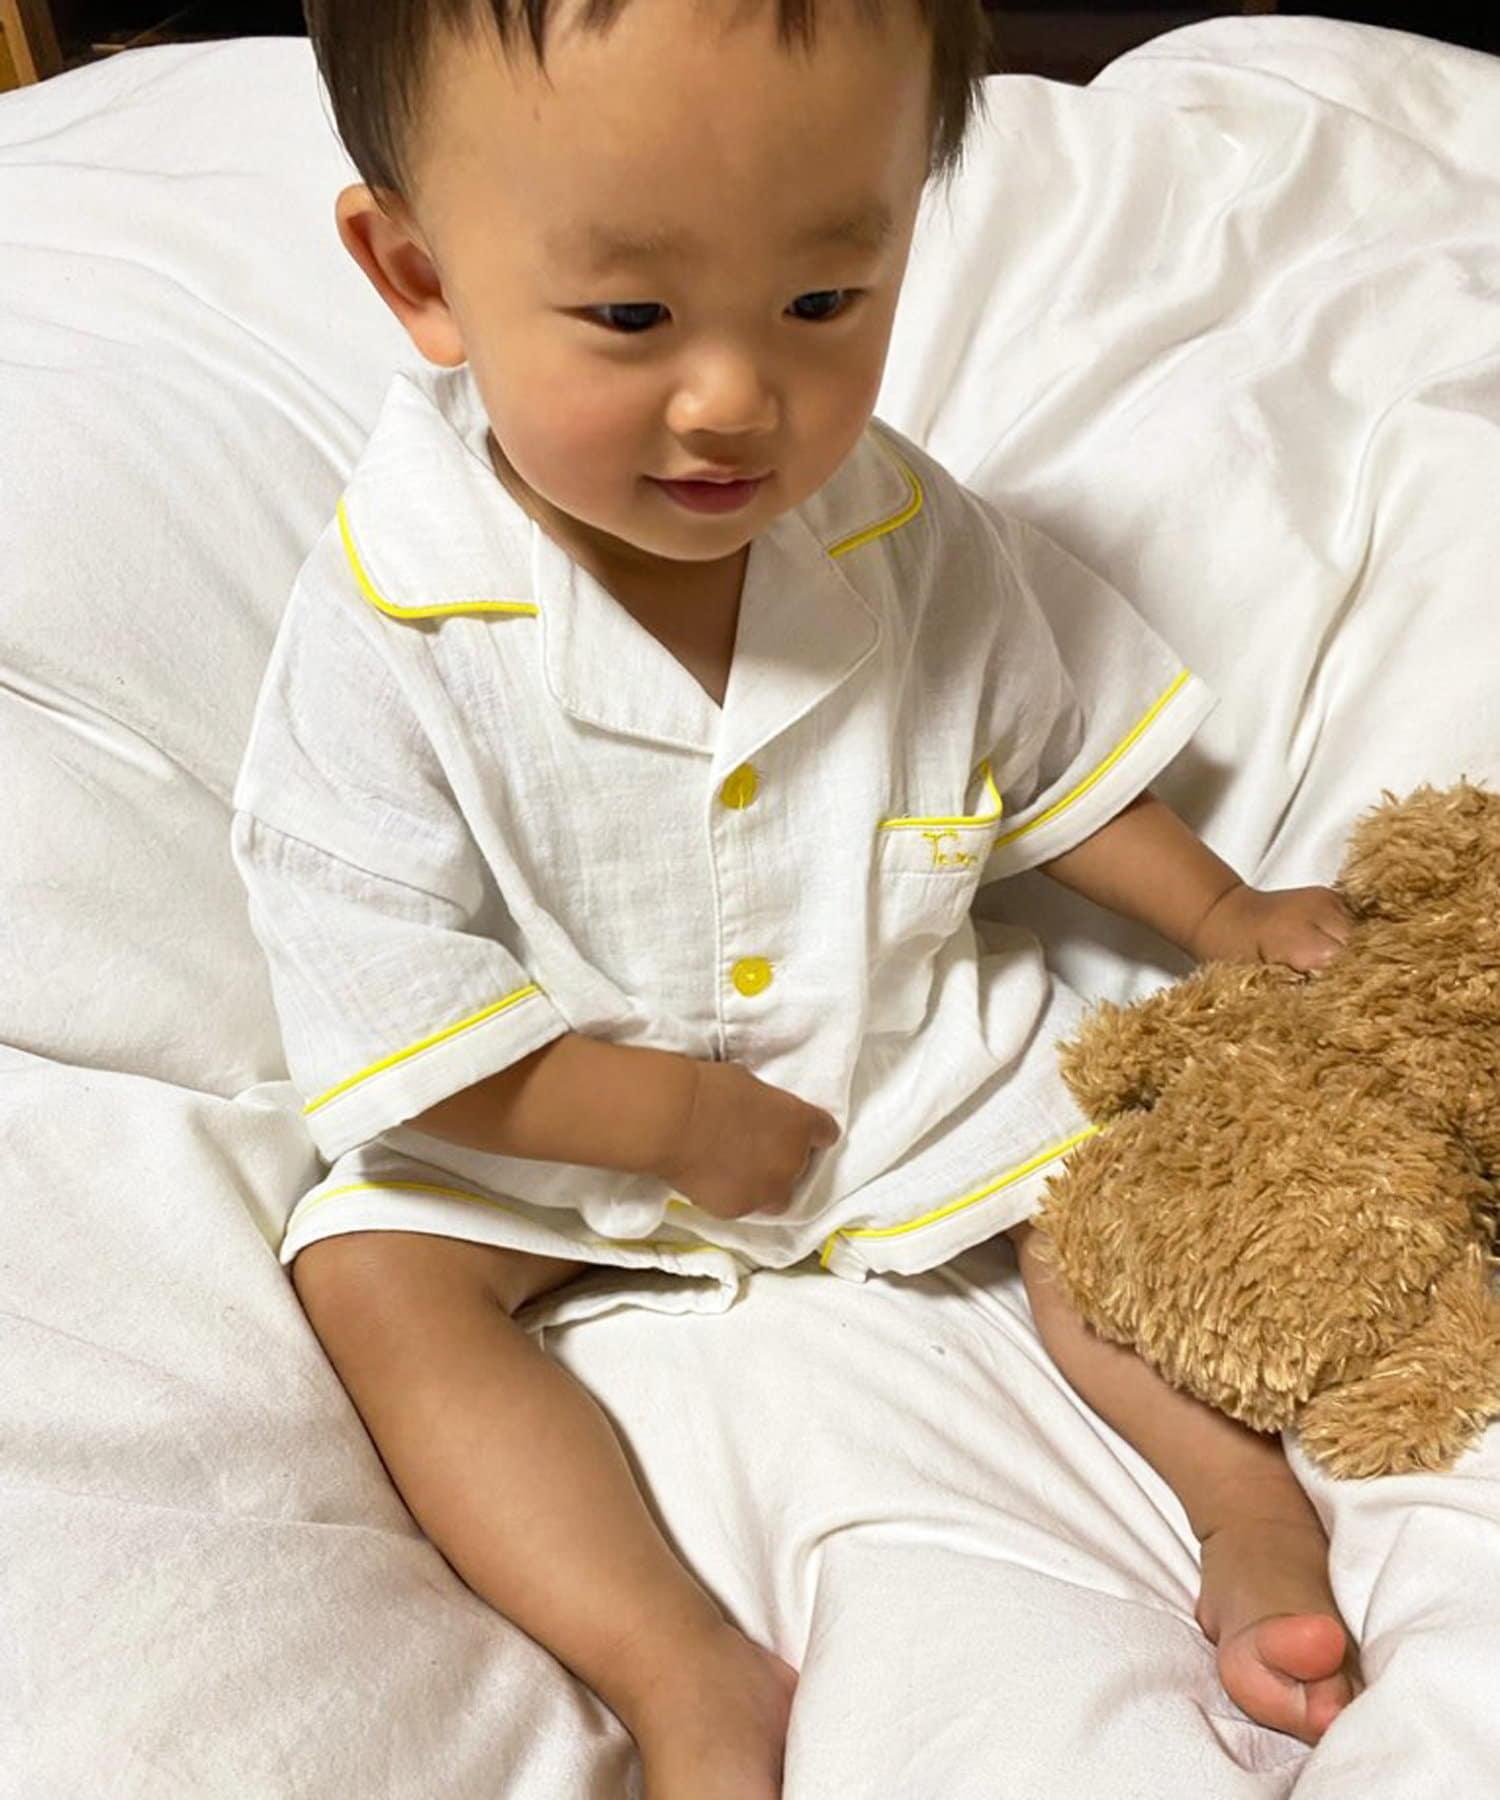 TERRITOIRE(テリトワール) キッズ 【KIDS 初登場!】オーガニックコットンしあわせWガーゼパジャマセット ホワイト